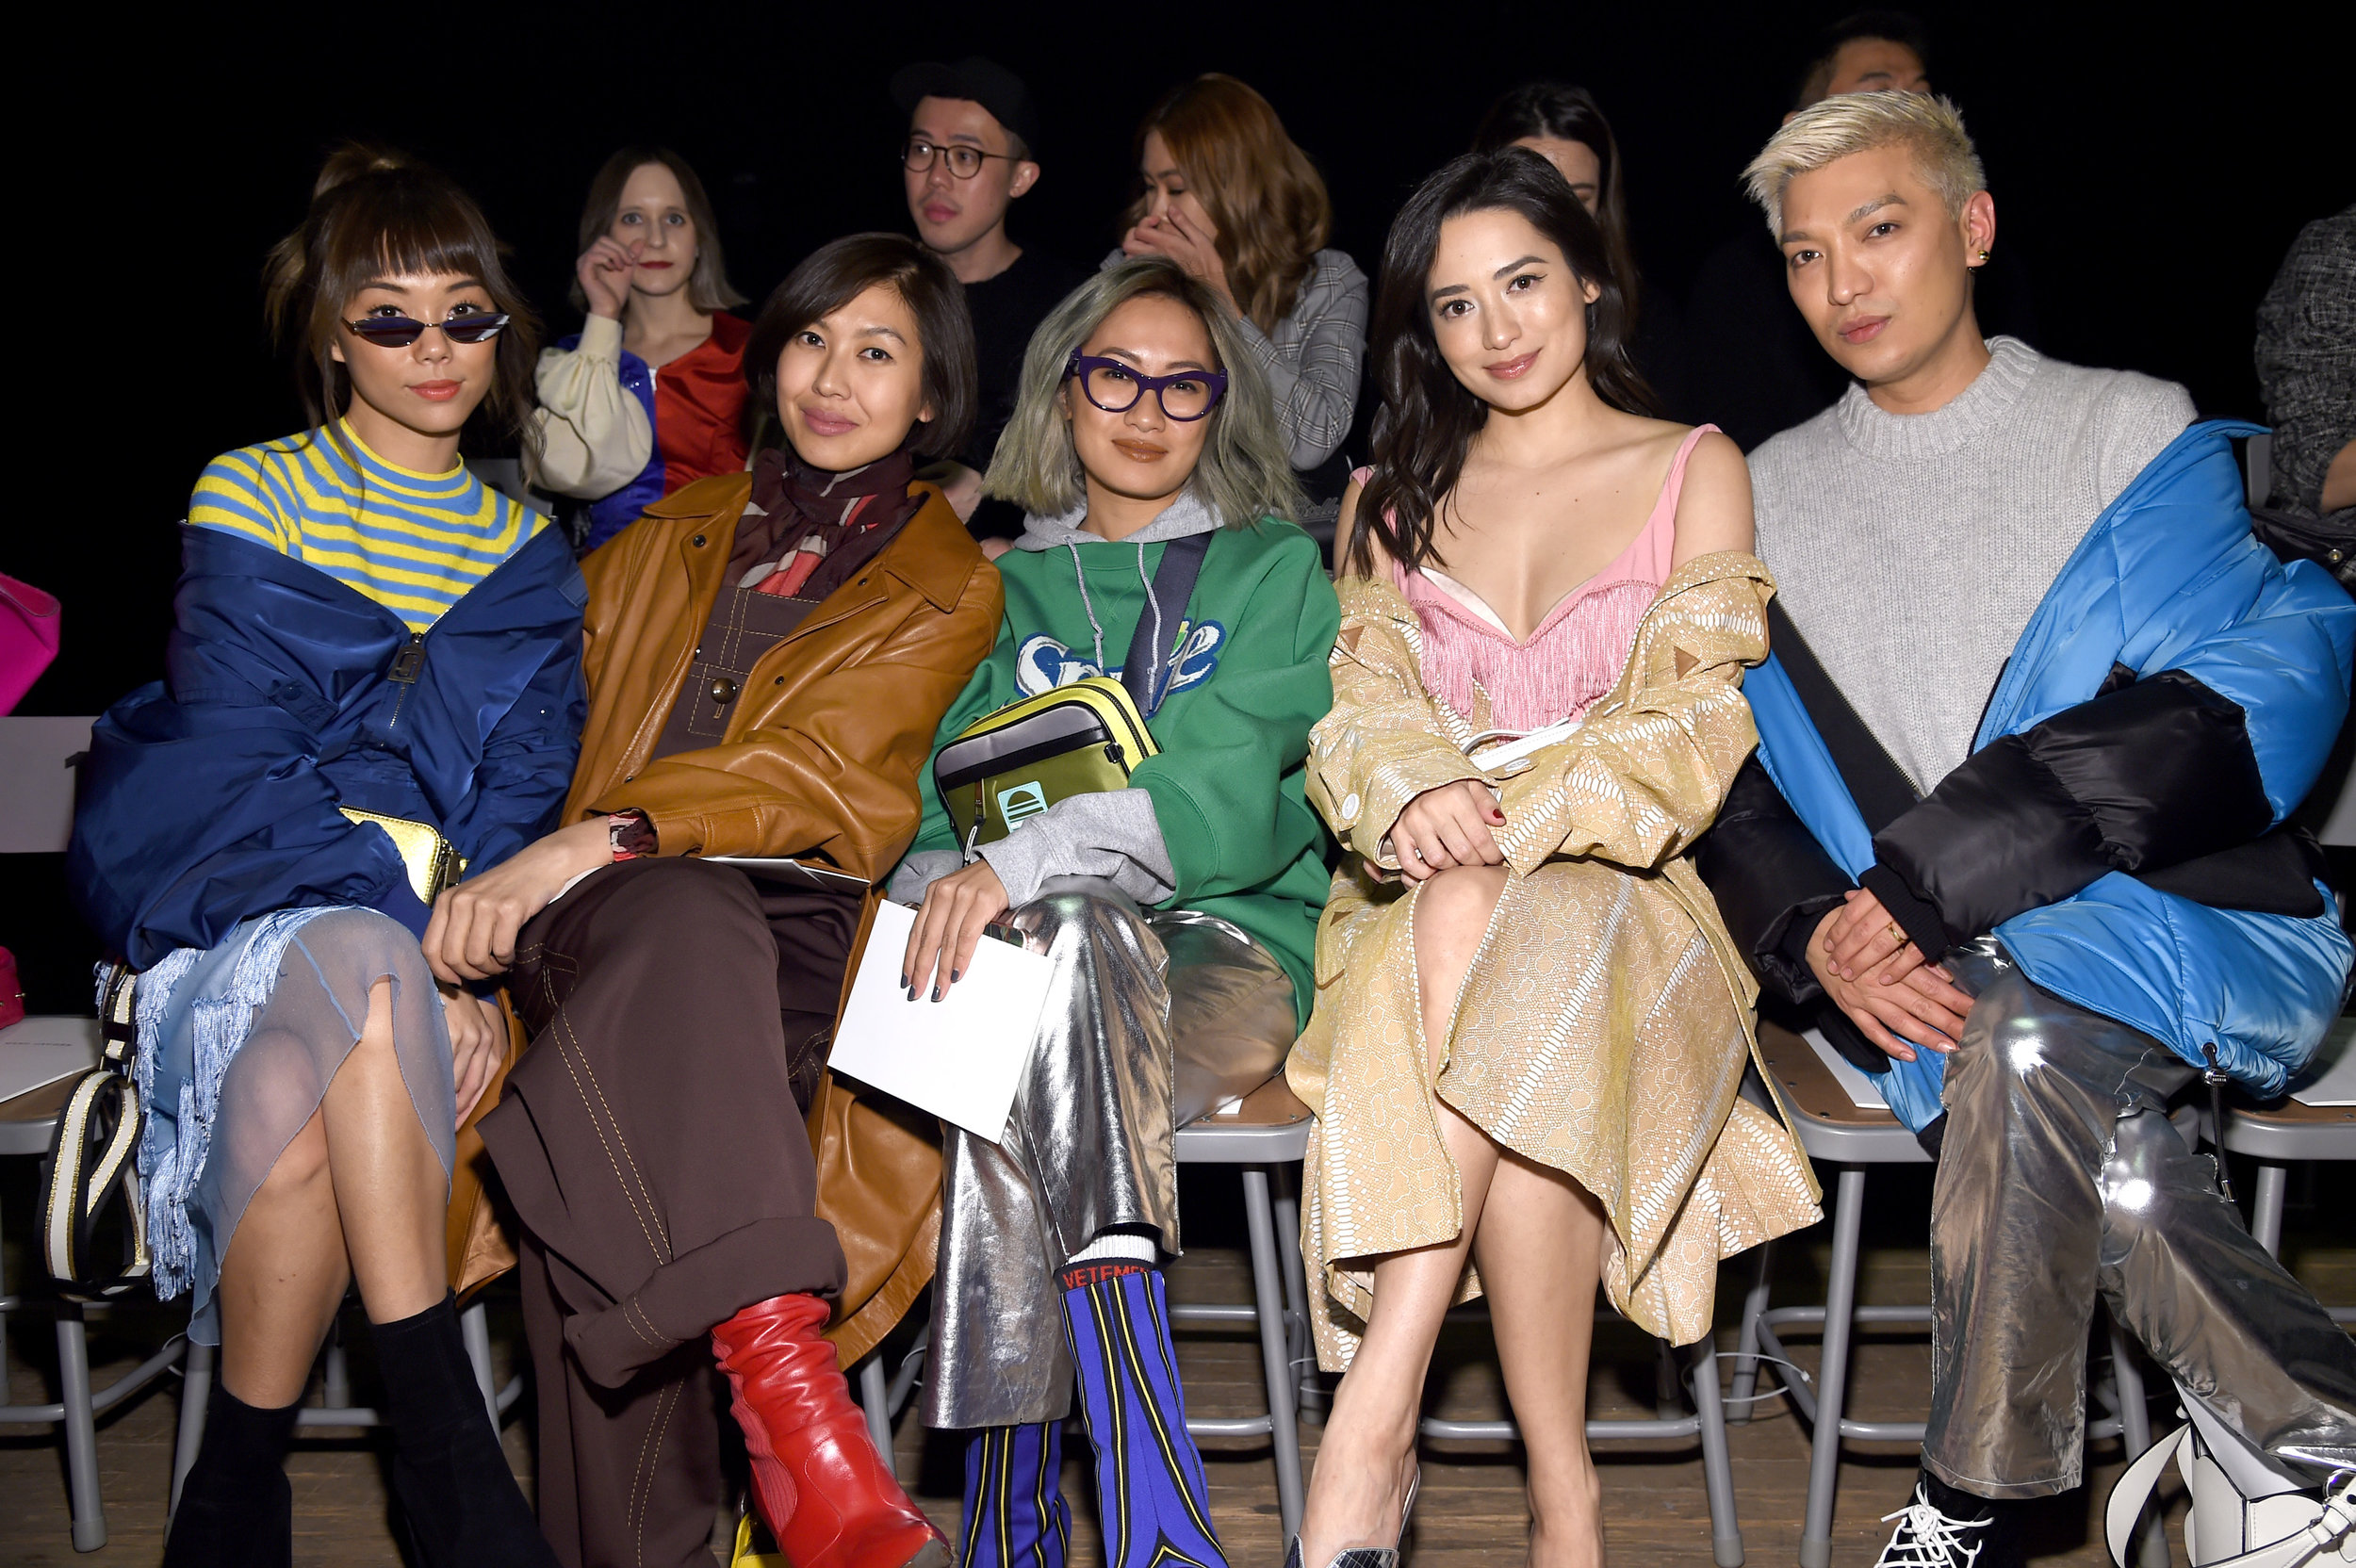 Andrea Chong, Liz Uy, Laureen Uy, Nicole Andersson and Bryan Boy